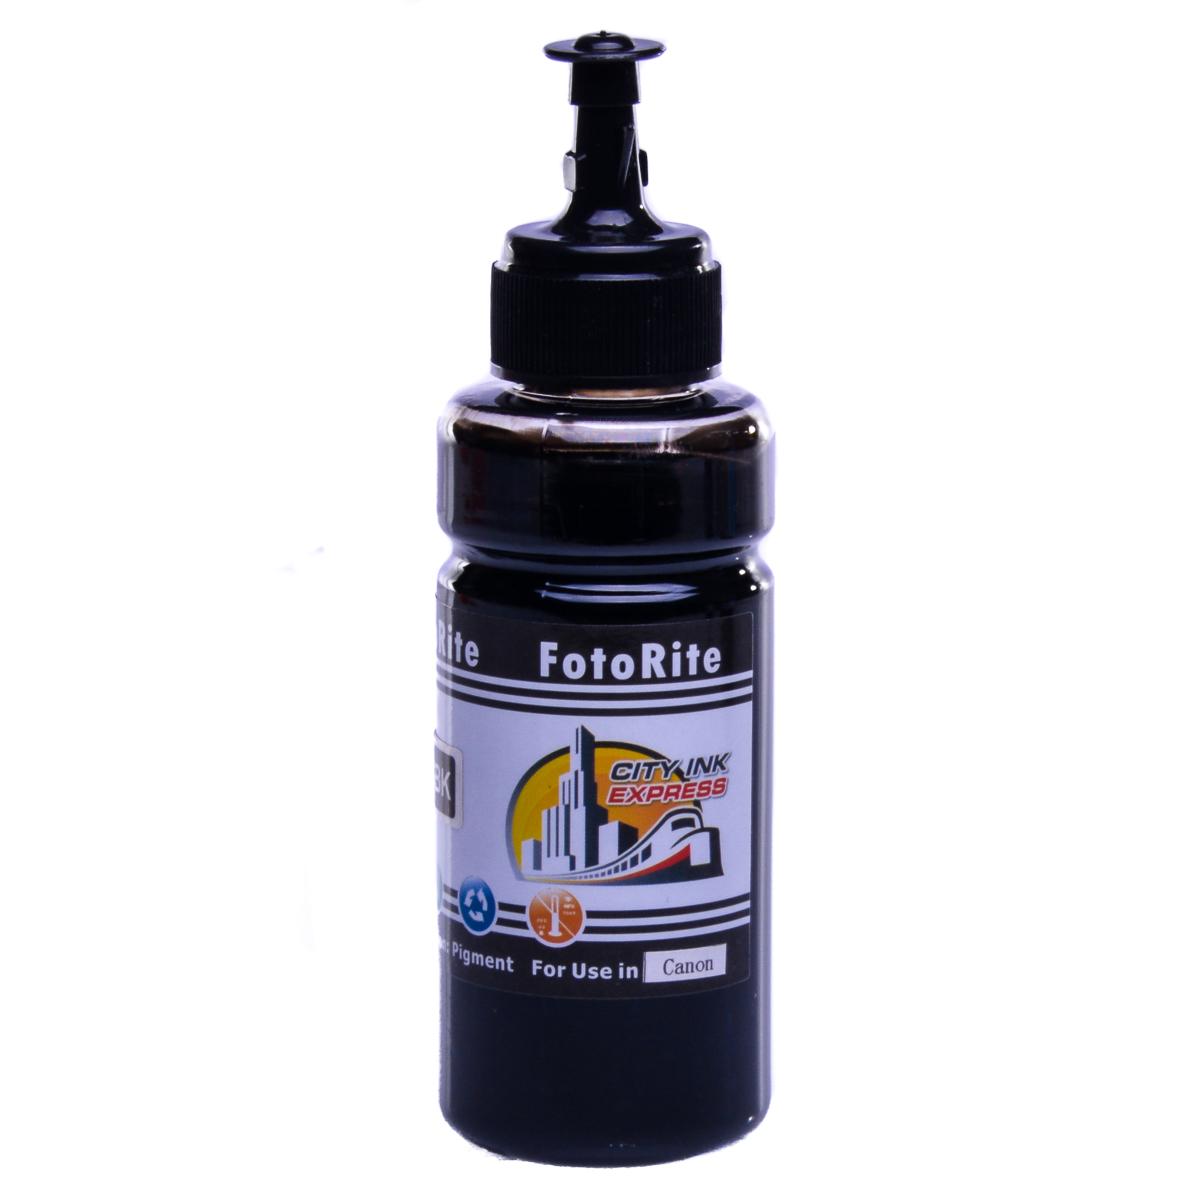 Cheap Pigment Black pigment ink replaces Canon Pixma TS6251 - PGI-580PGBK